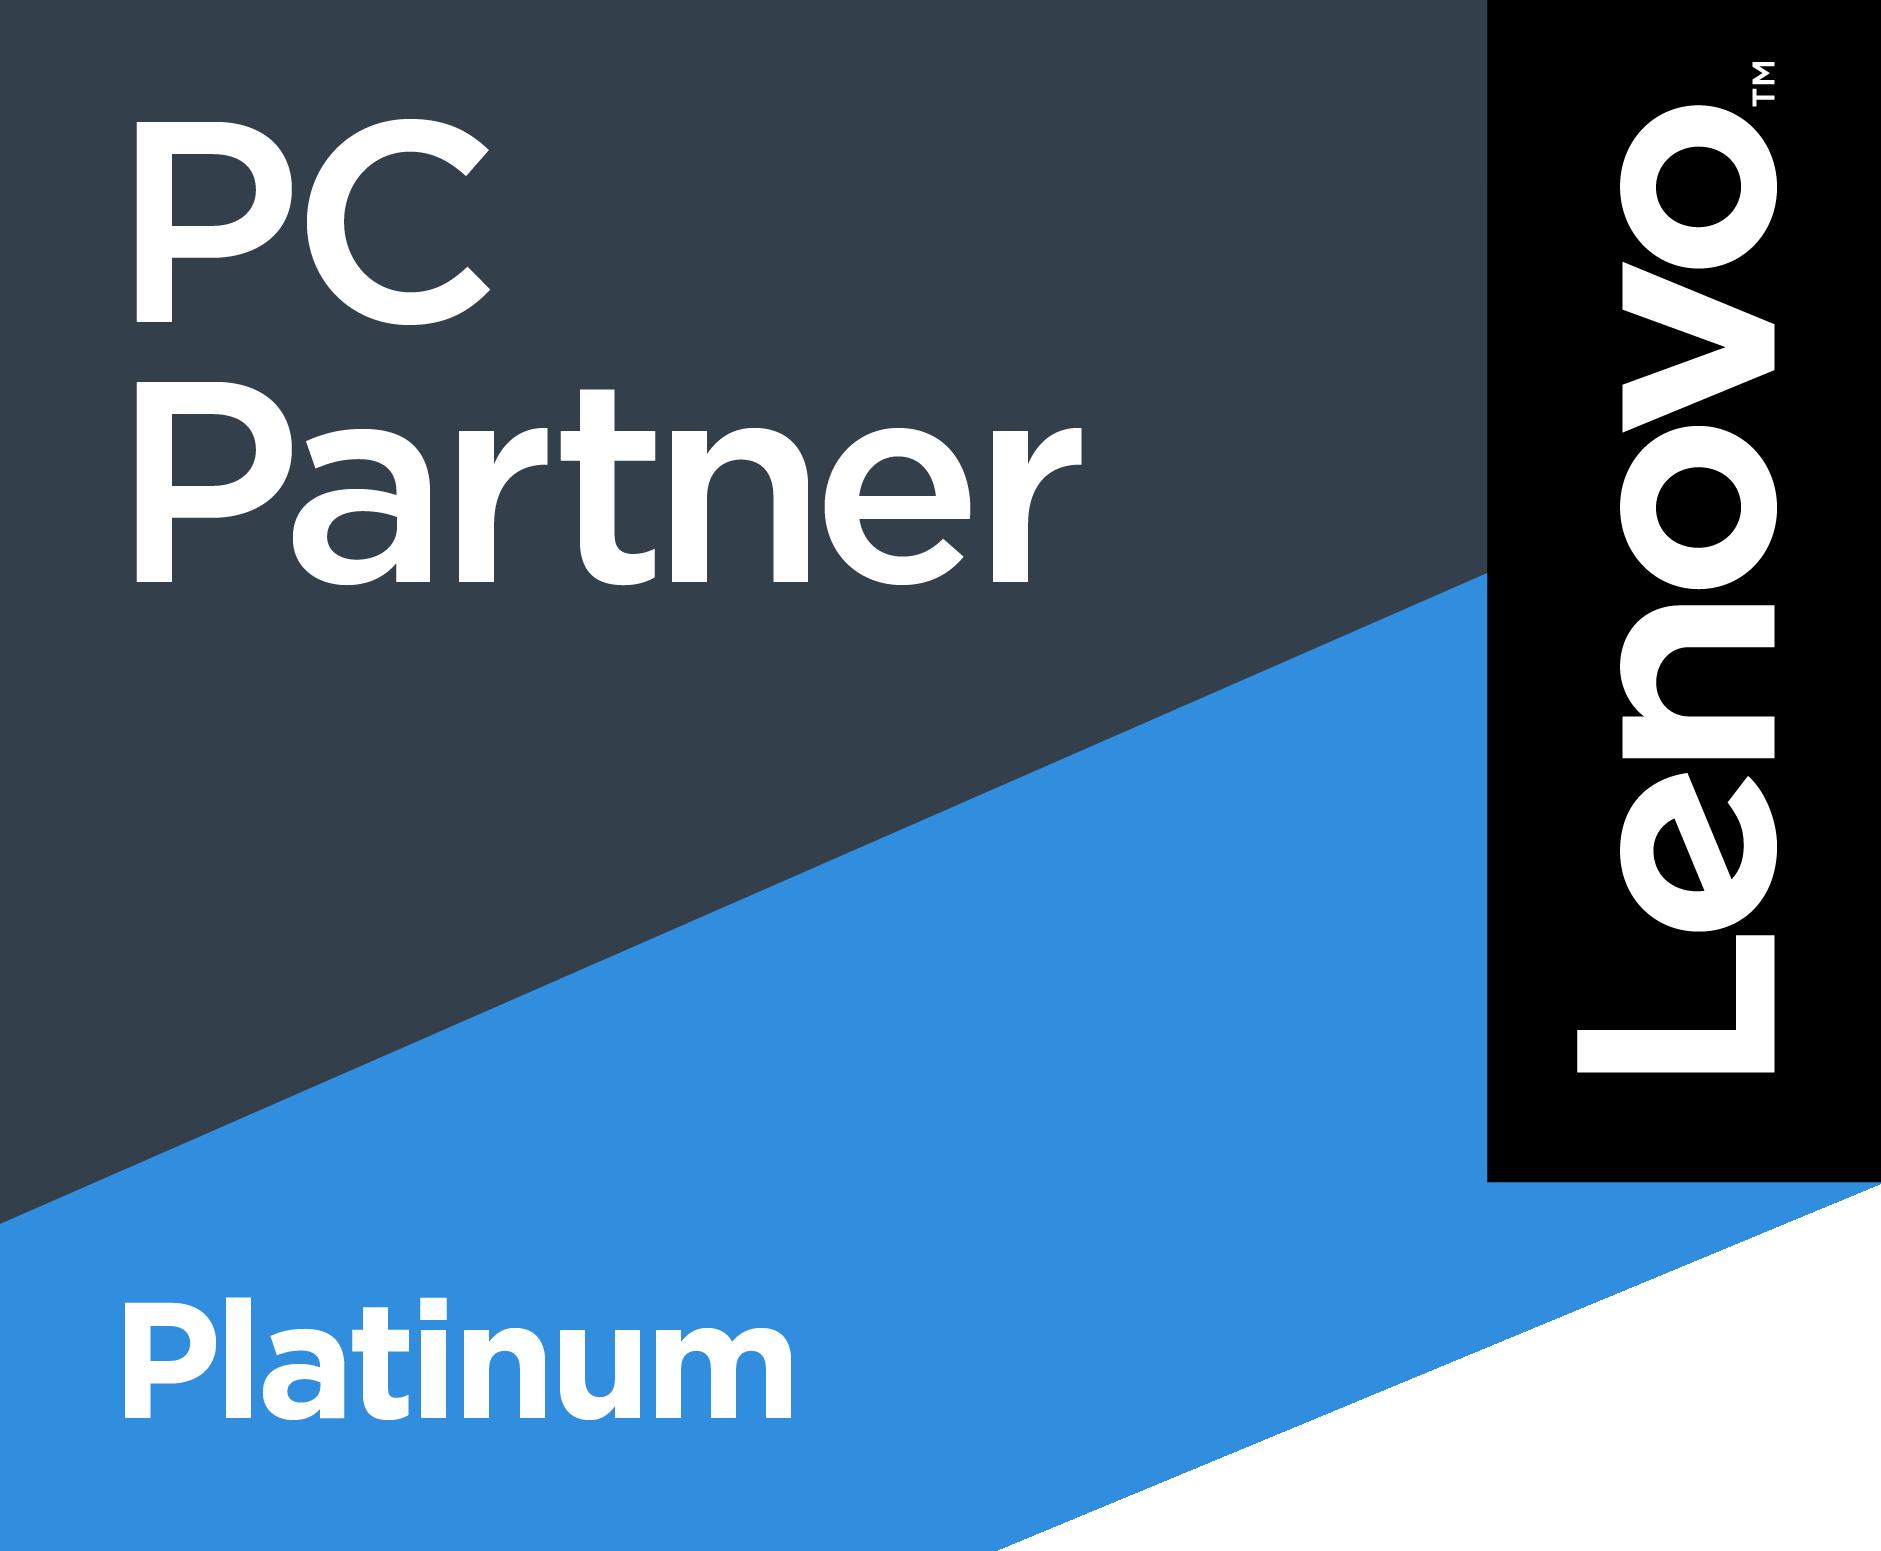 Vohkus Lenovo Platinum PC Partner